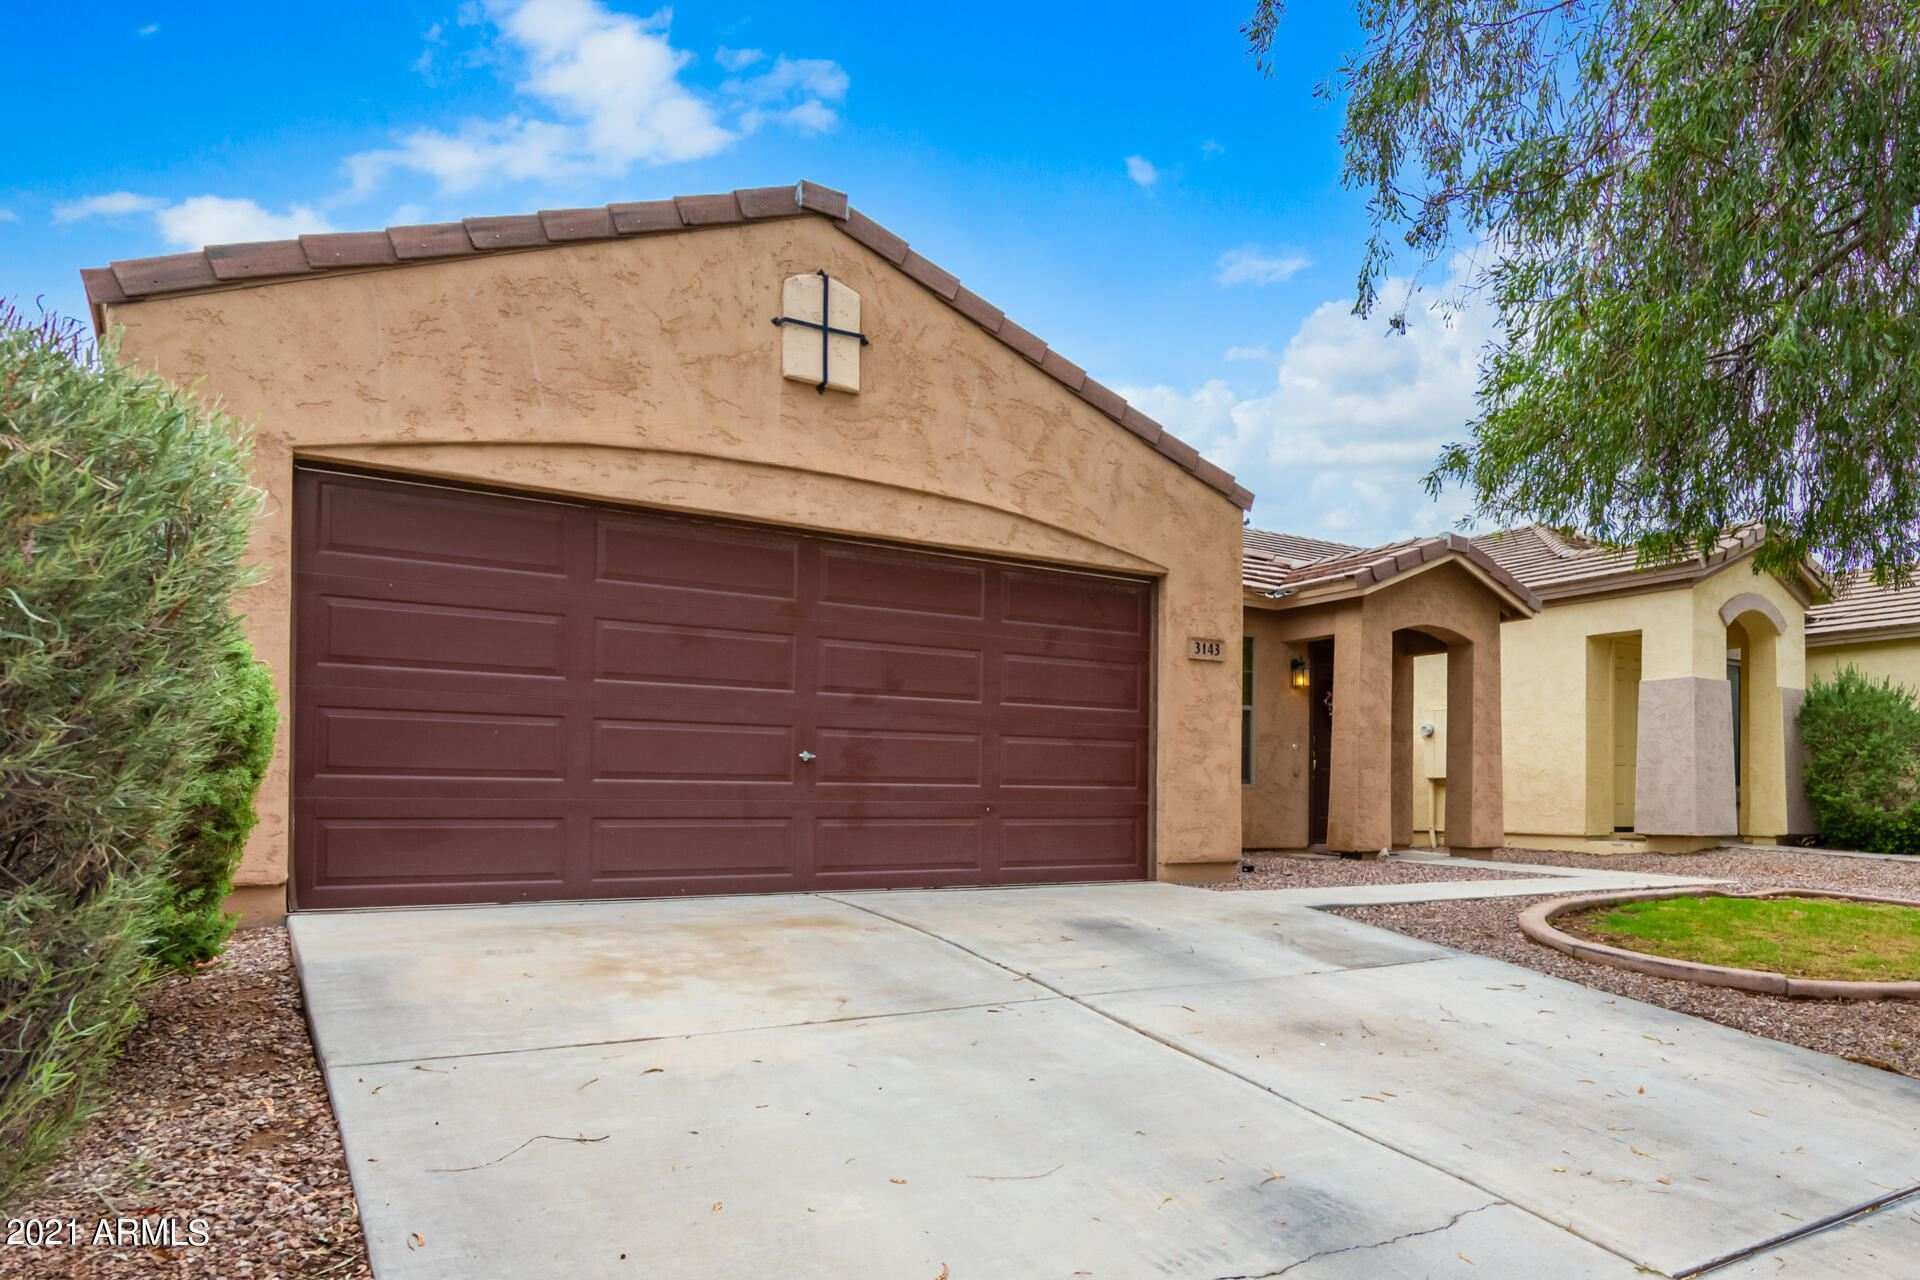 3143 W DANCER Lane, Queen Creek, AZ 85142 - MLS#: 6264524